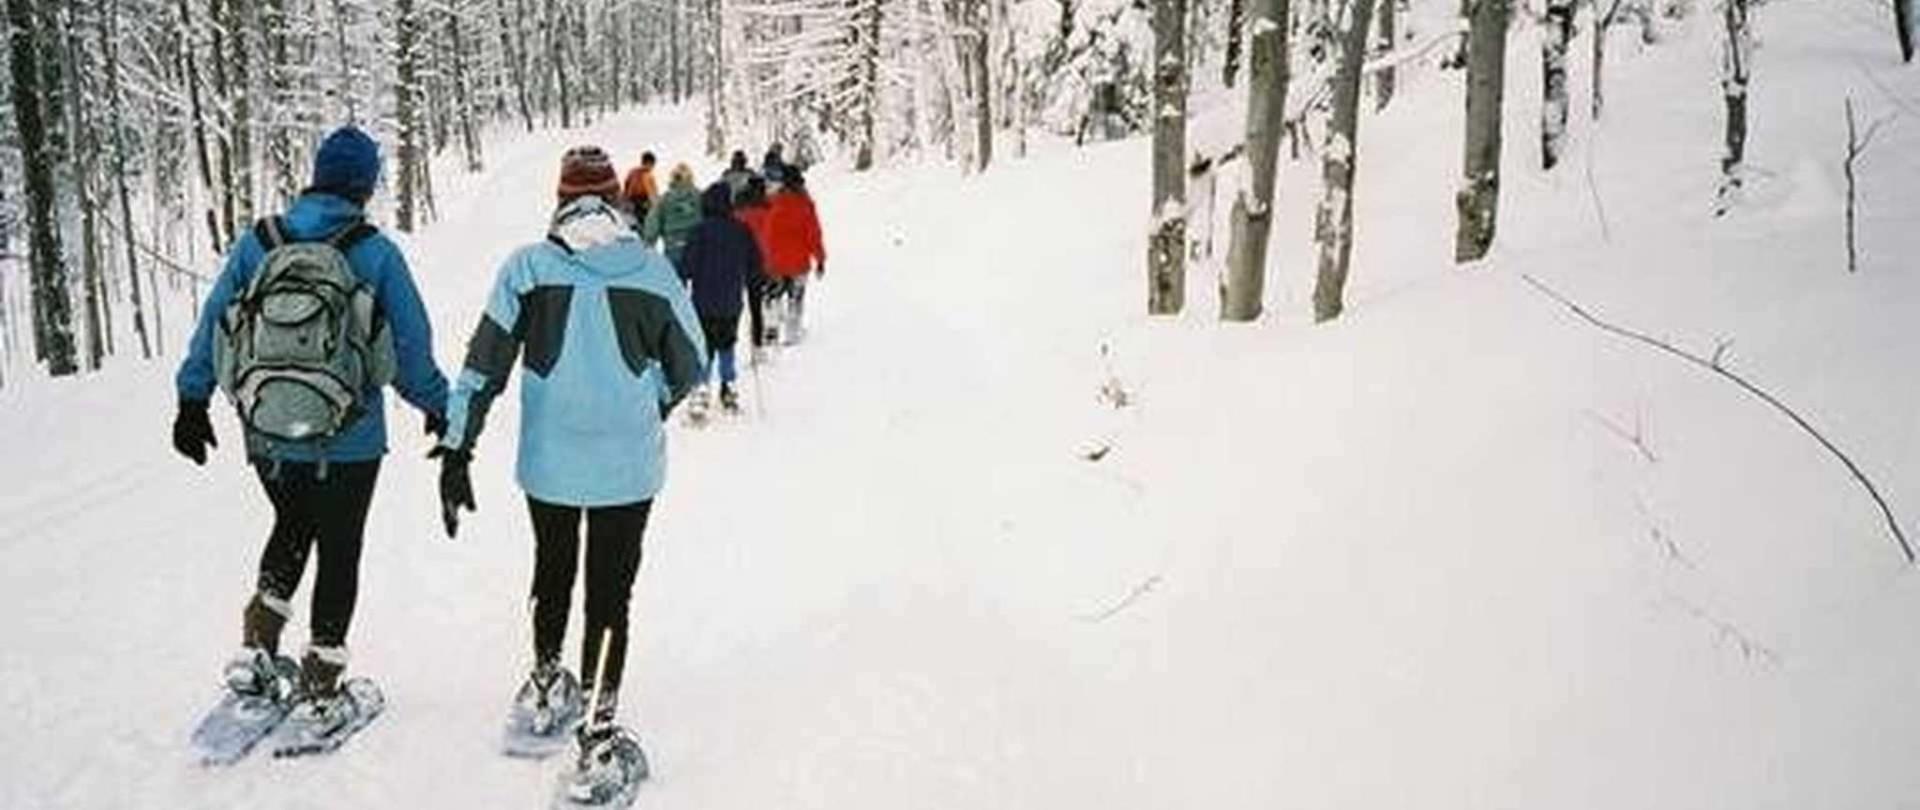 snowshoeing.jpg.1920x810_default.jpeg.1920x0.jpeg